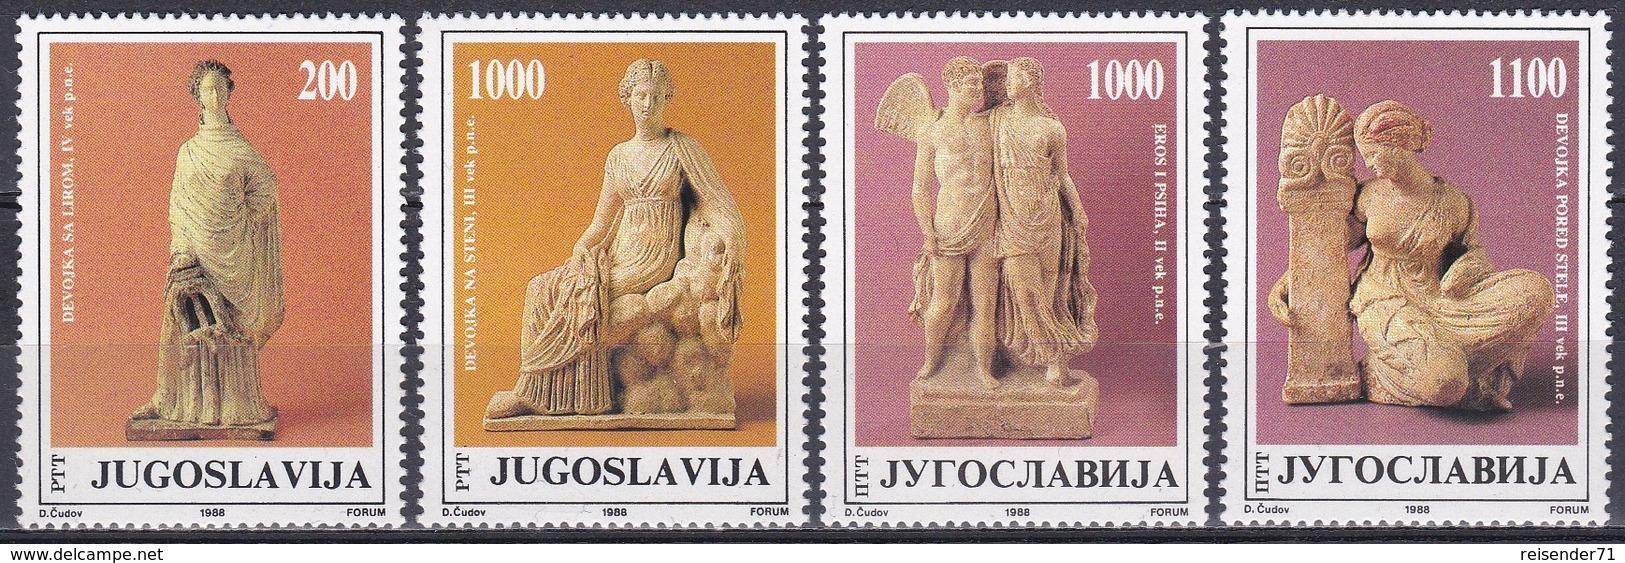 Jugoslawien Jugoslavia 1988 Kunst Arts Kultur Culture Terrakotta Terracotta Figuren Figures Josip Tito, Mi. 2307-0 ** - 1945-1992 Socialist Federal Republic Of Yugoslavia